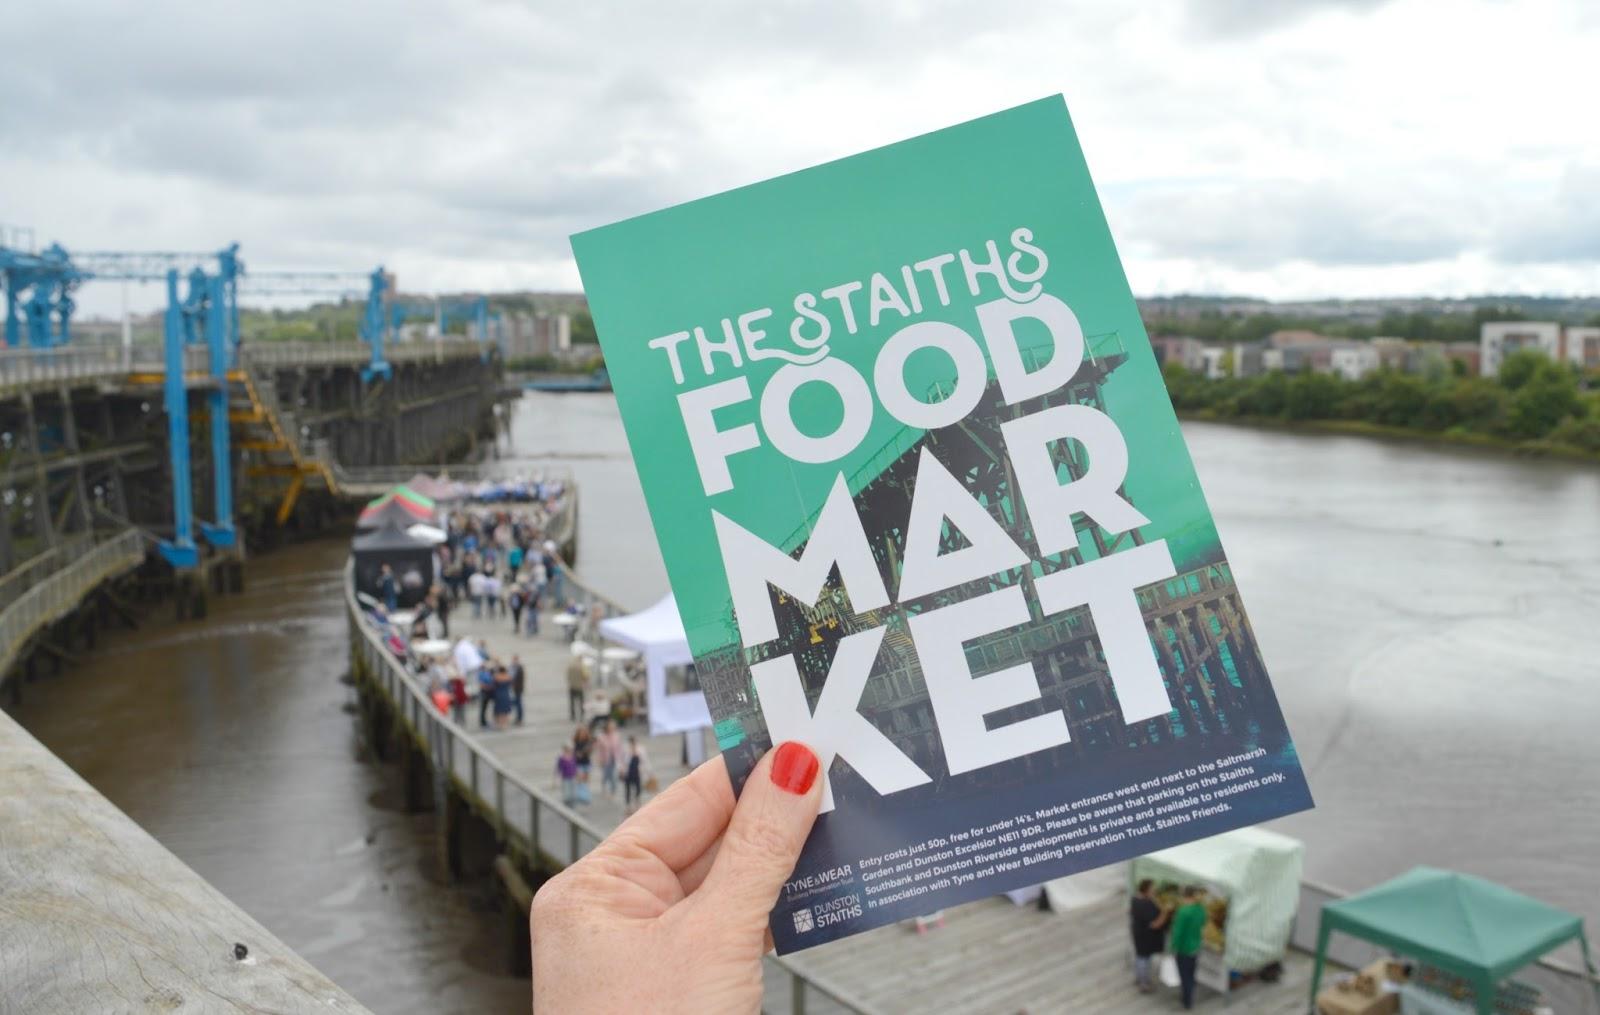 Staiths Food Market Gateshead